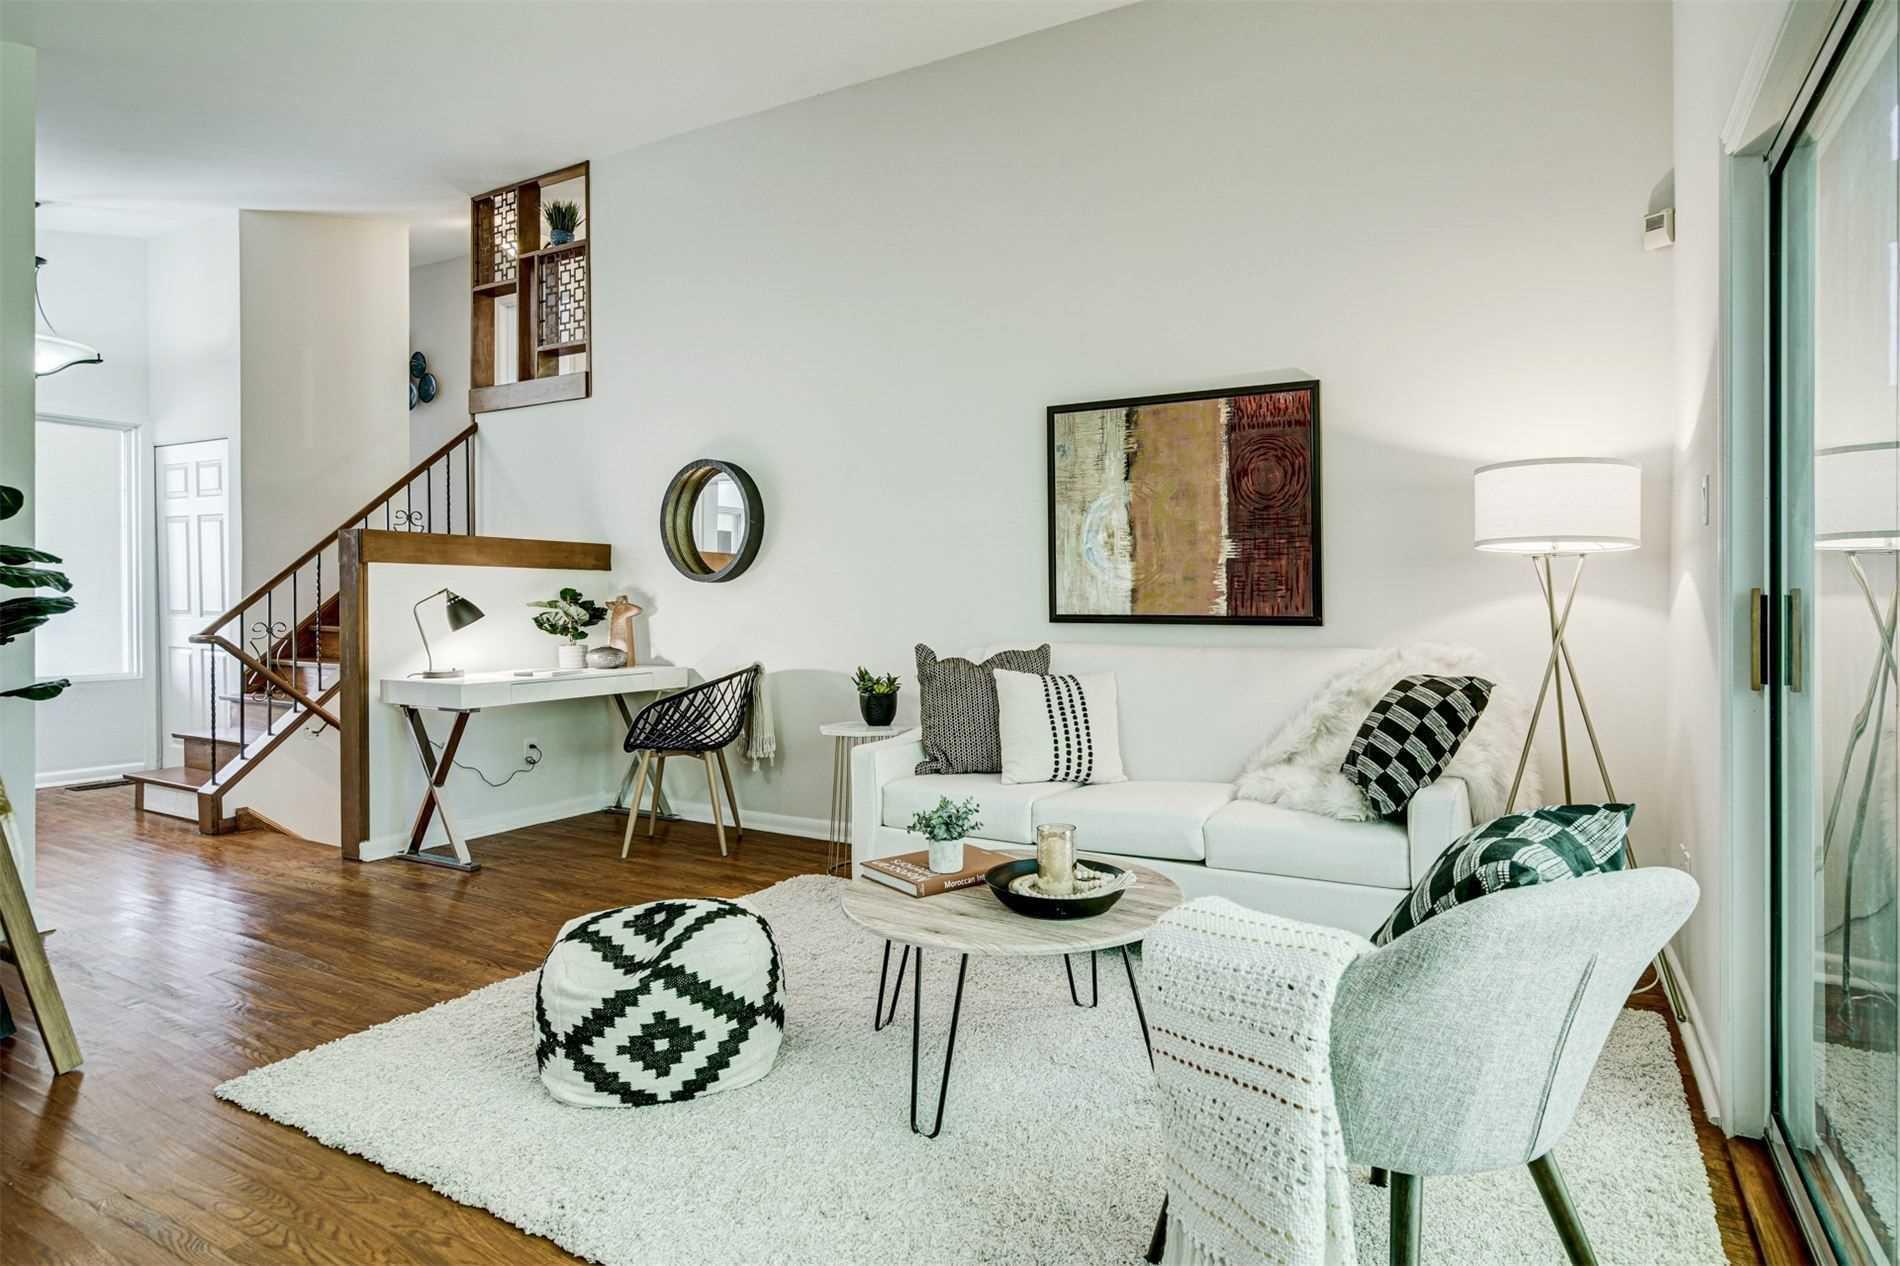 140 Verobeach Blvd - Humbermede Detached for sale, 3 Bedrooms (W5385046) - #2